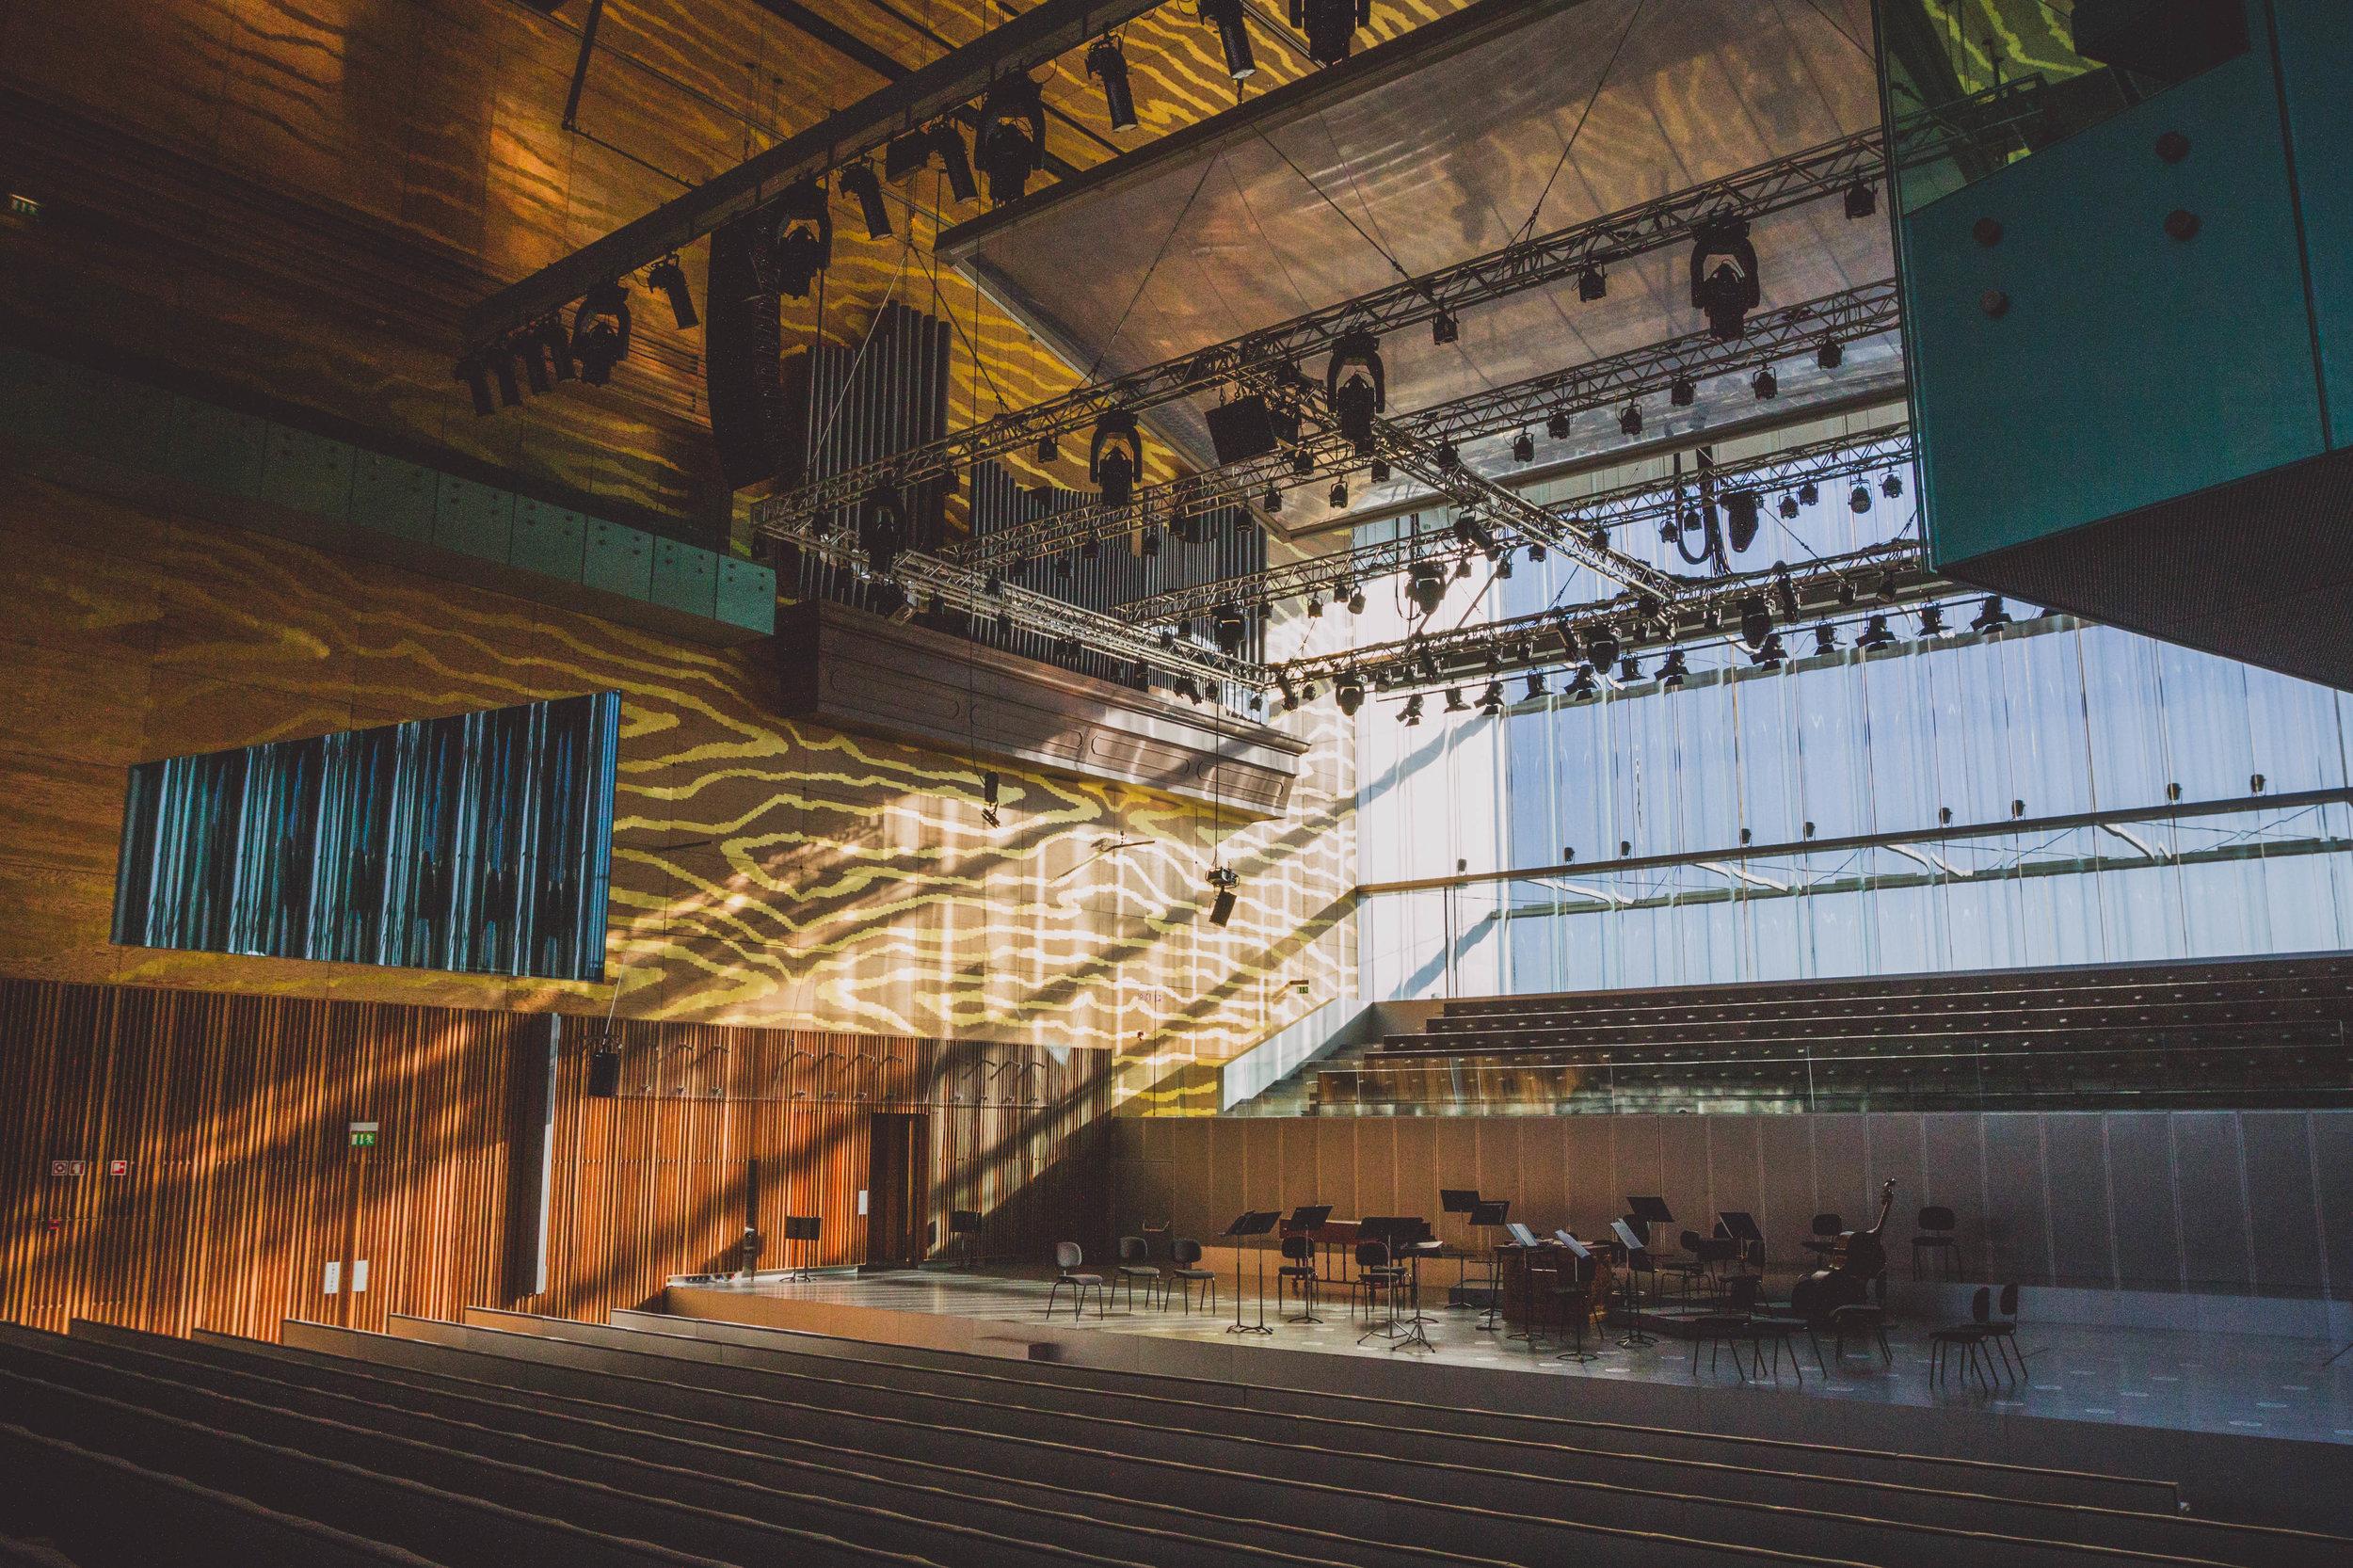 Concert Hall Interior. Photo by Anna Harding.